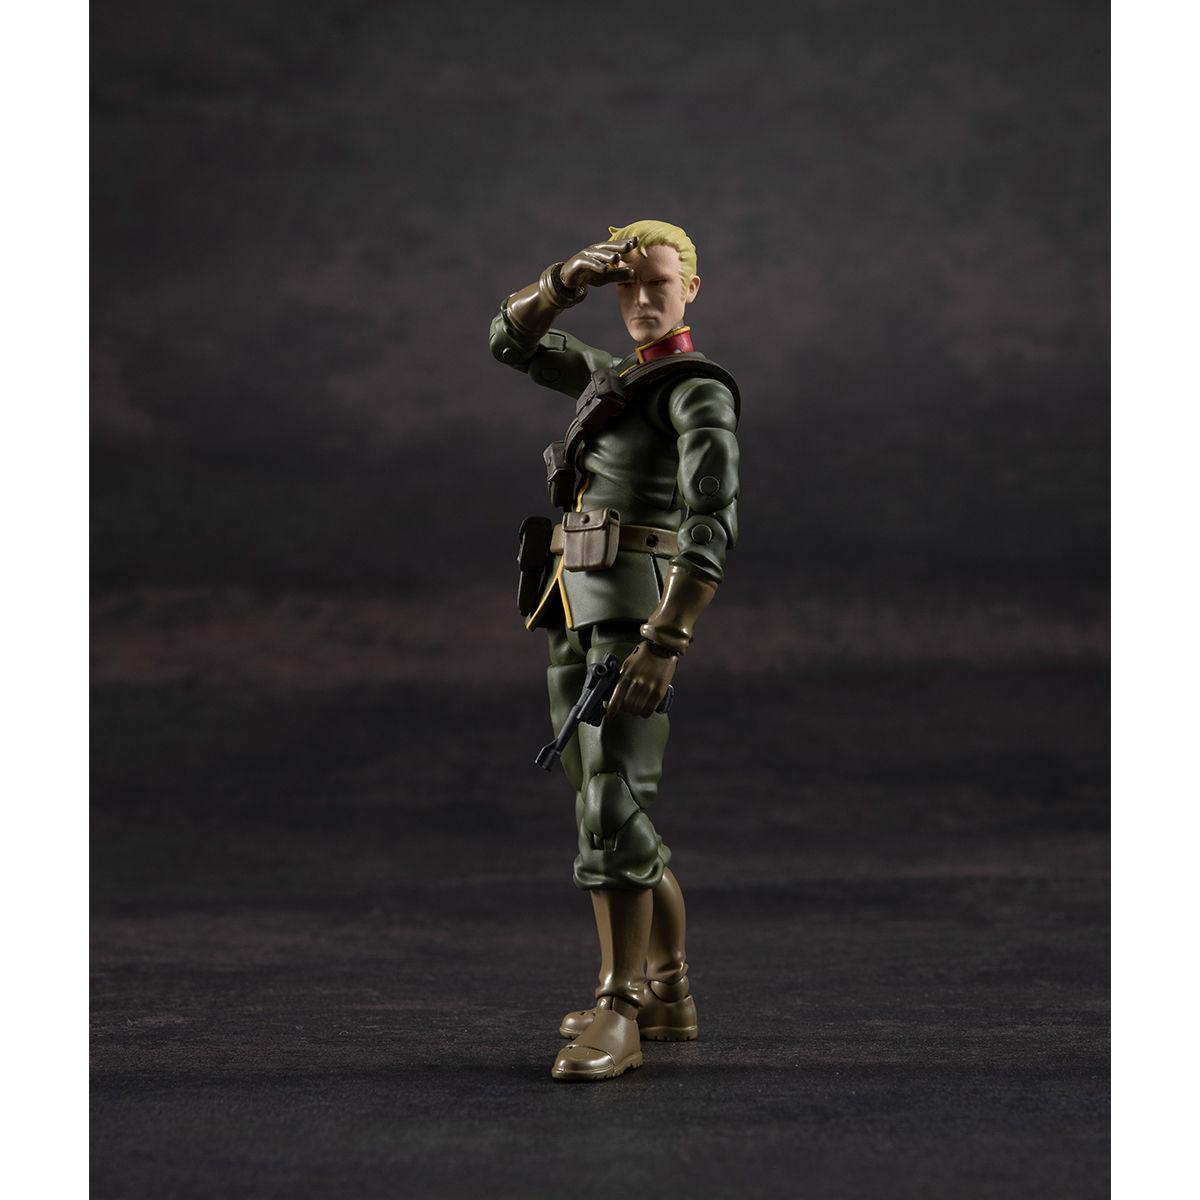 G.M.G. ガンダムミリタリージェネレーション『ジオン公国軍一般兵士01』1/18 可動フィギュア-006